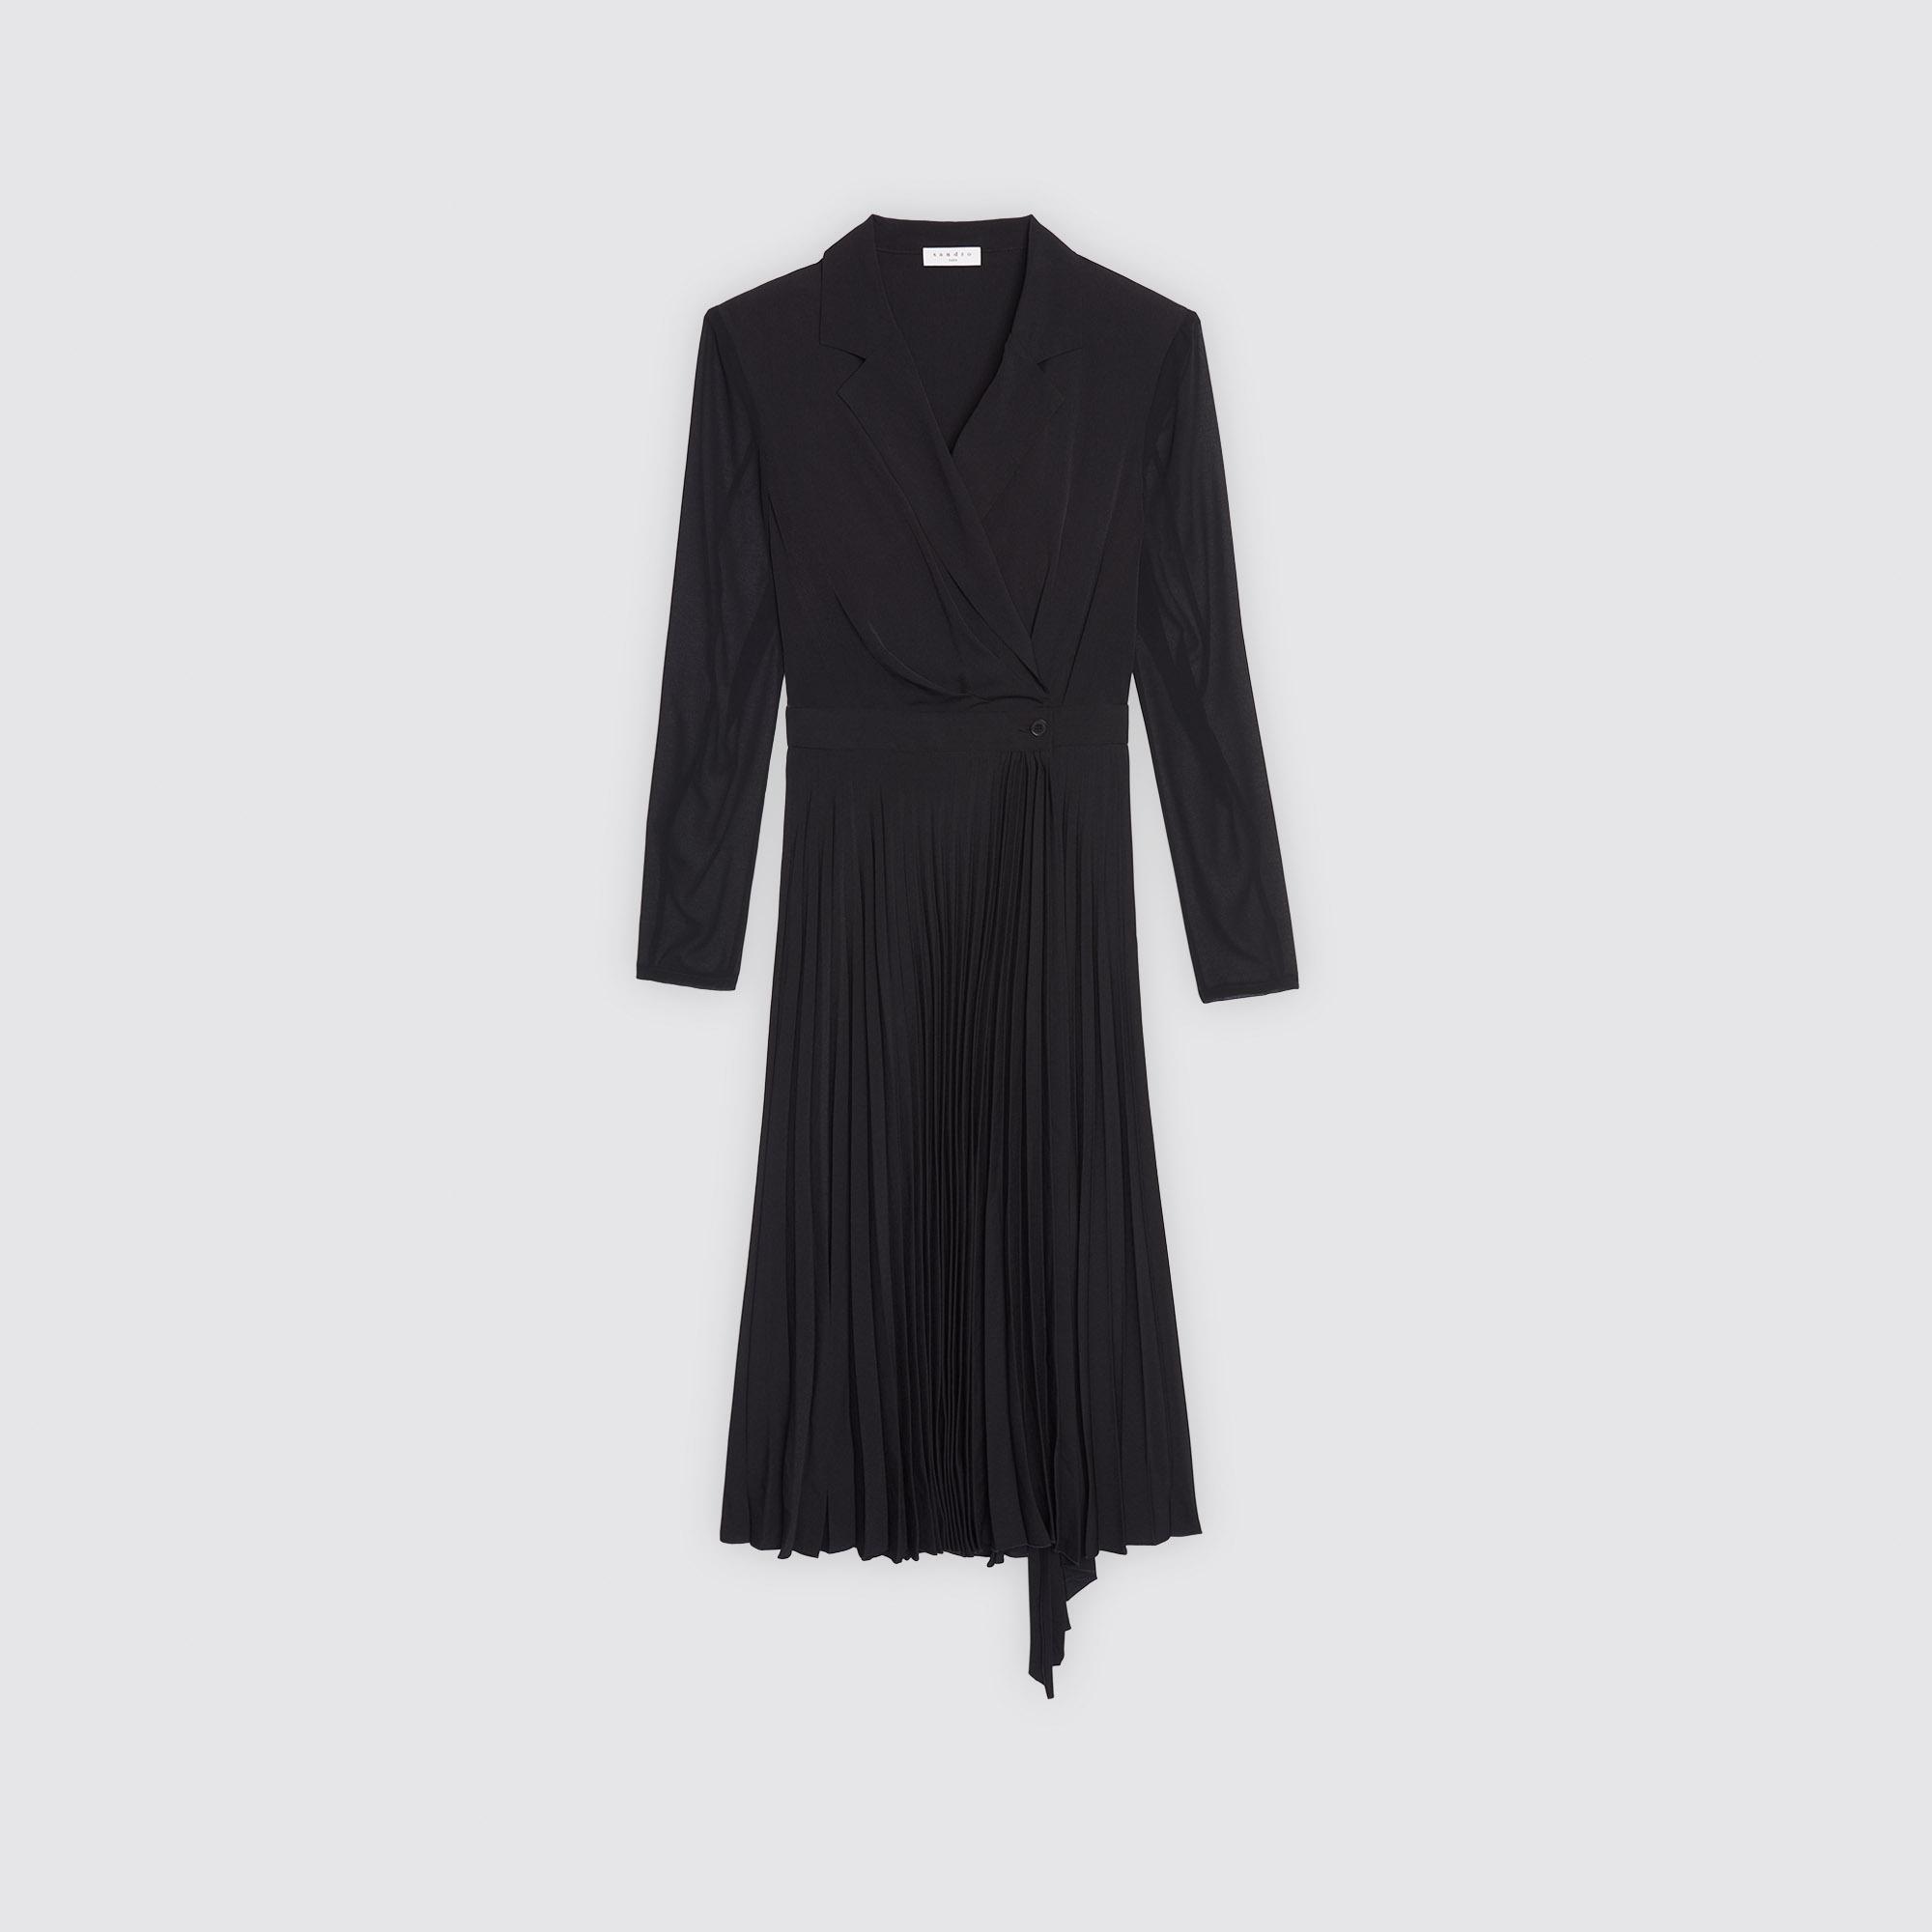 Robe Bimatière R20201h Longues Manches À Paris Robes Sandro Twrq4TcH